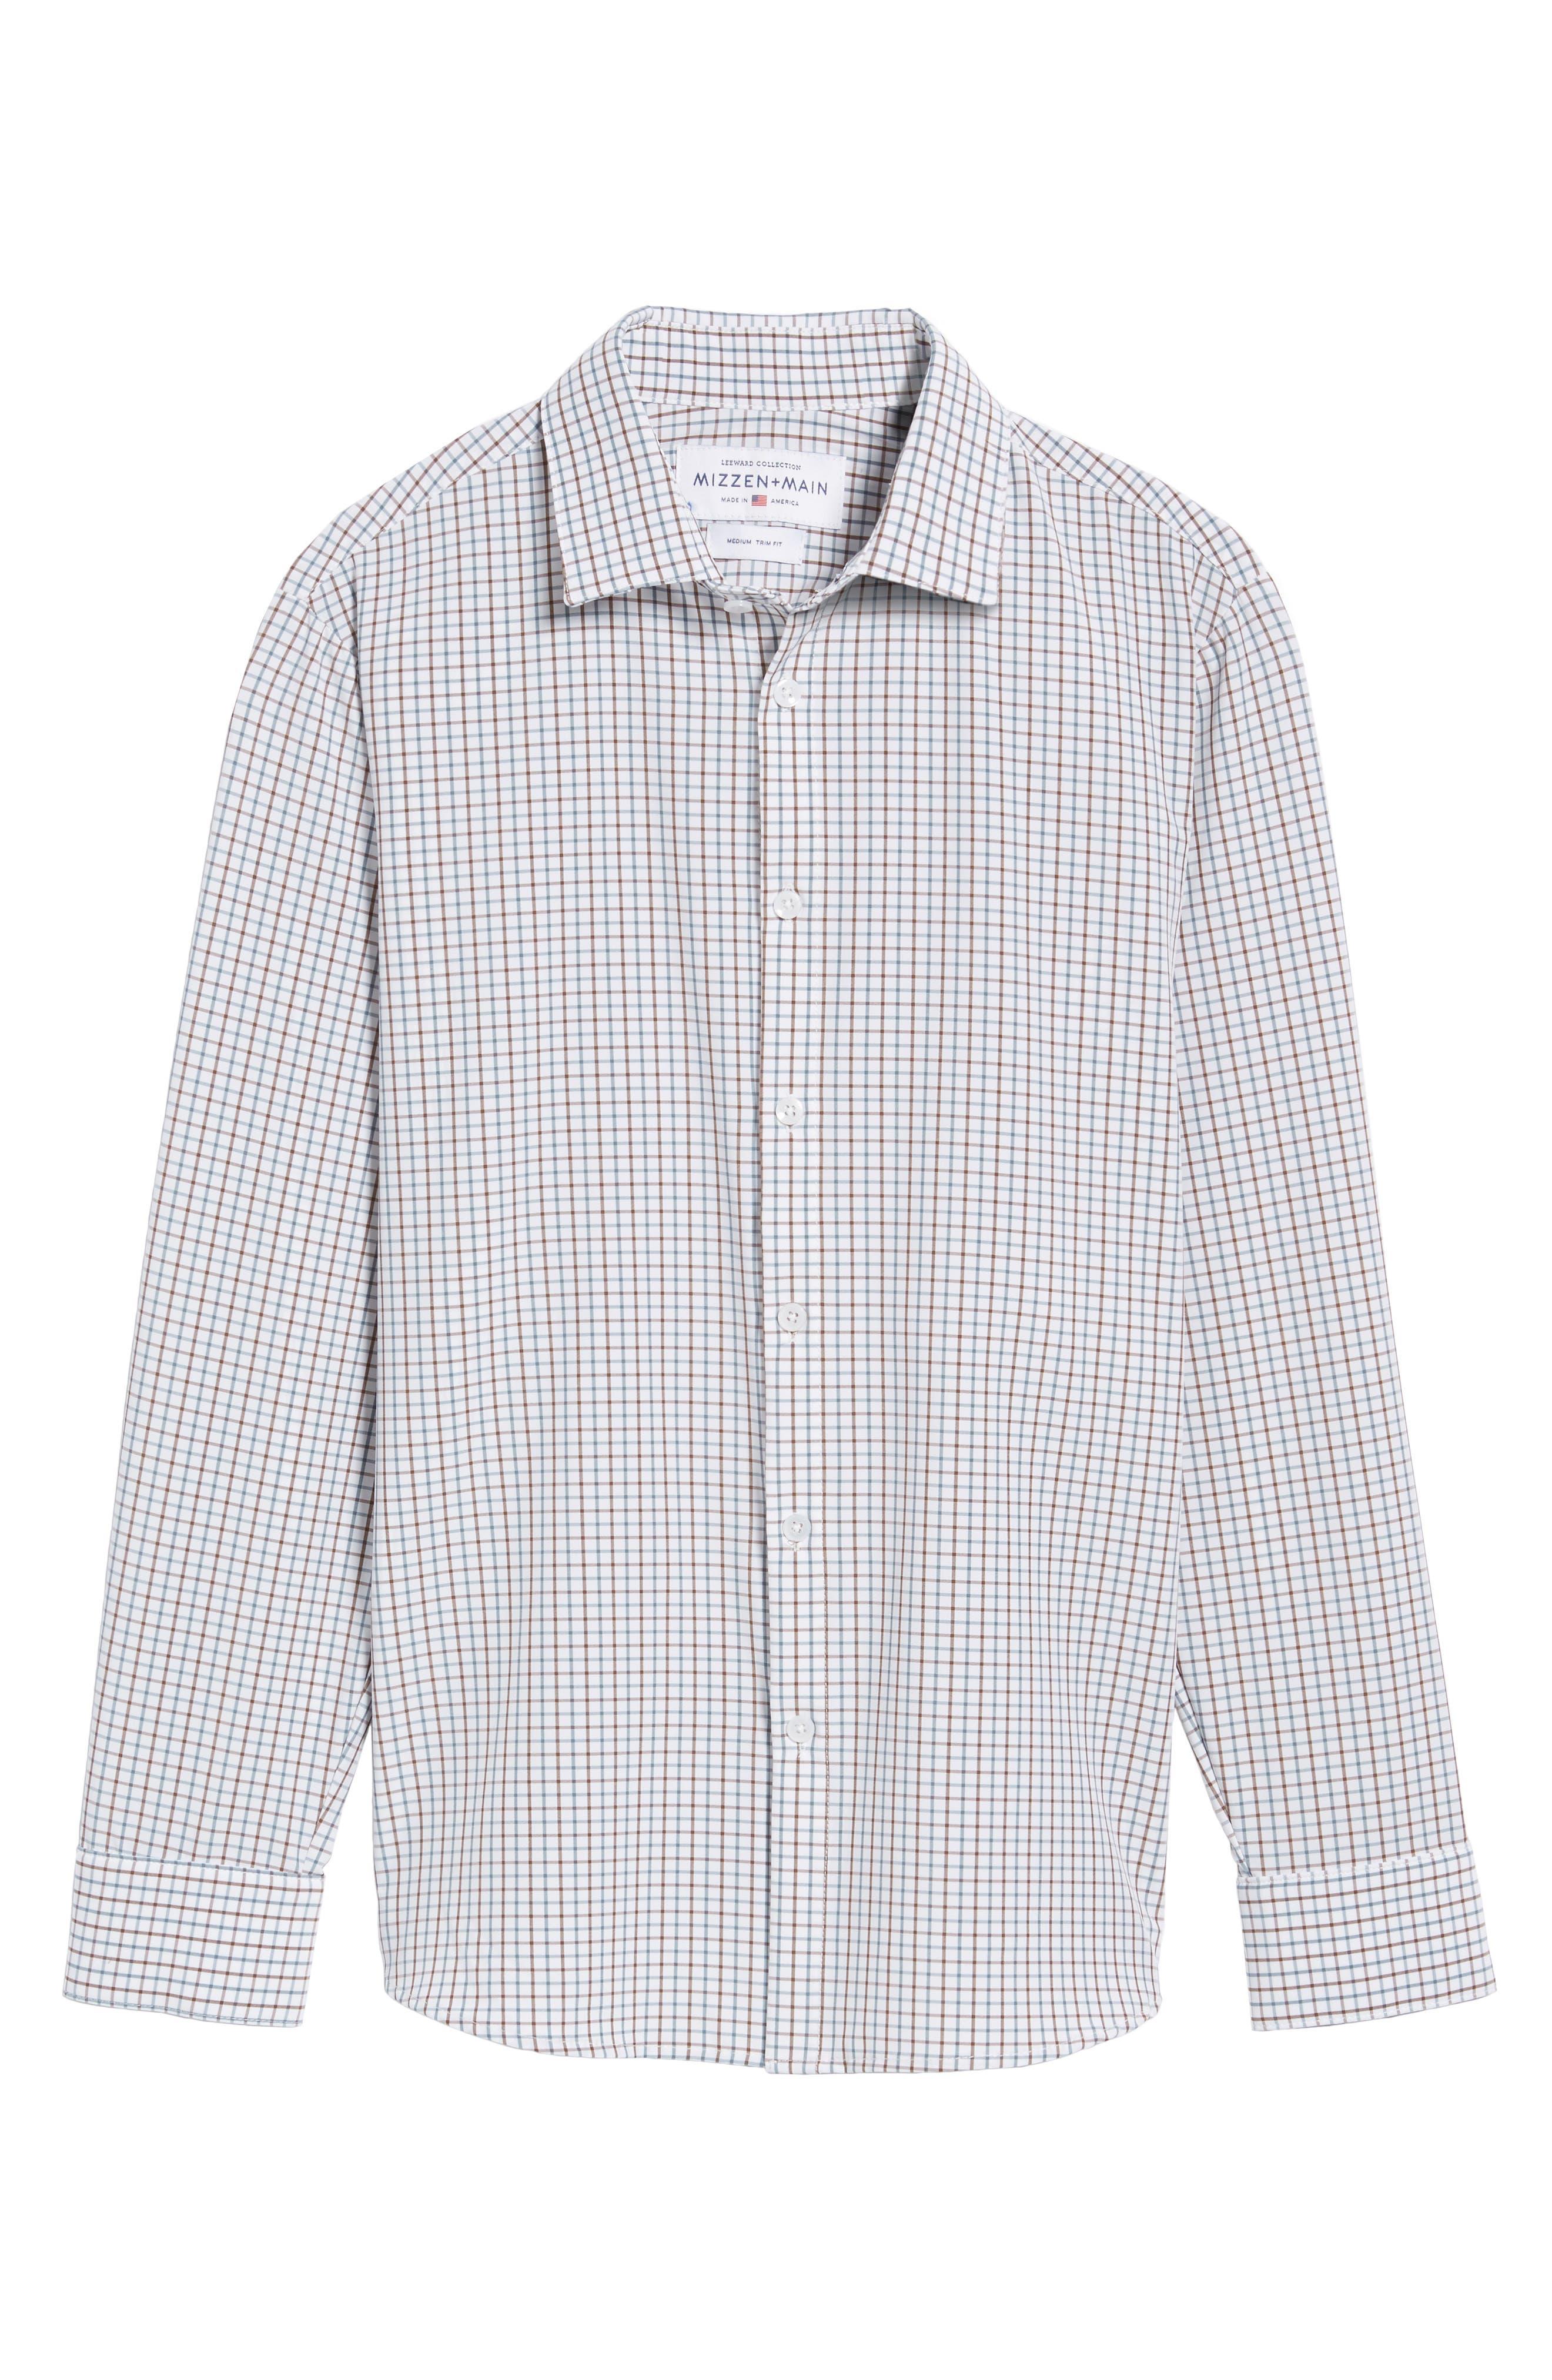 Nolan Slim Fit Tattersall Performance Sport Shirt,                             Alternate thumbnail 6, color,                             White